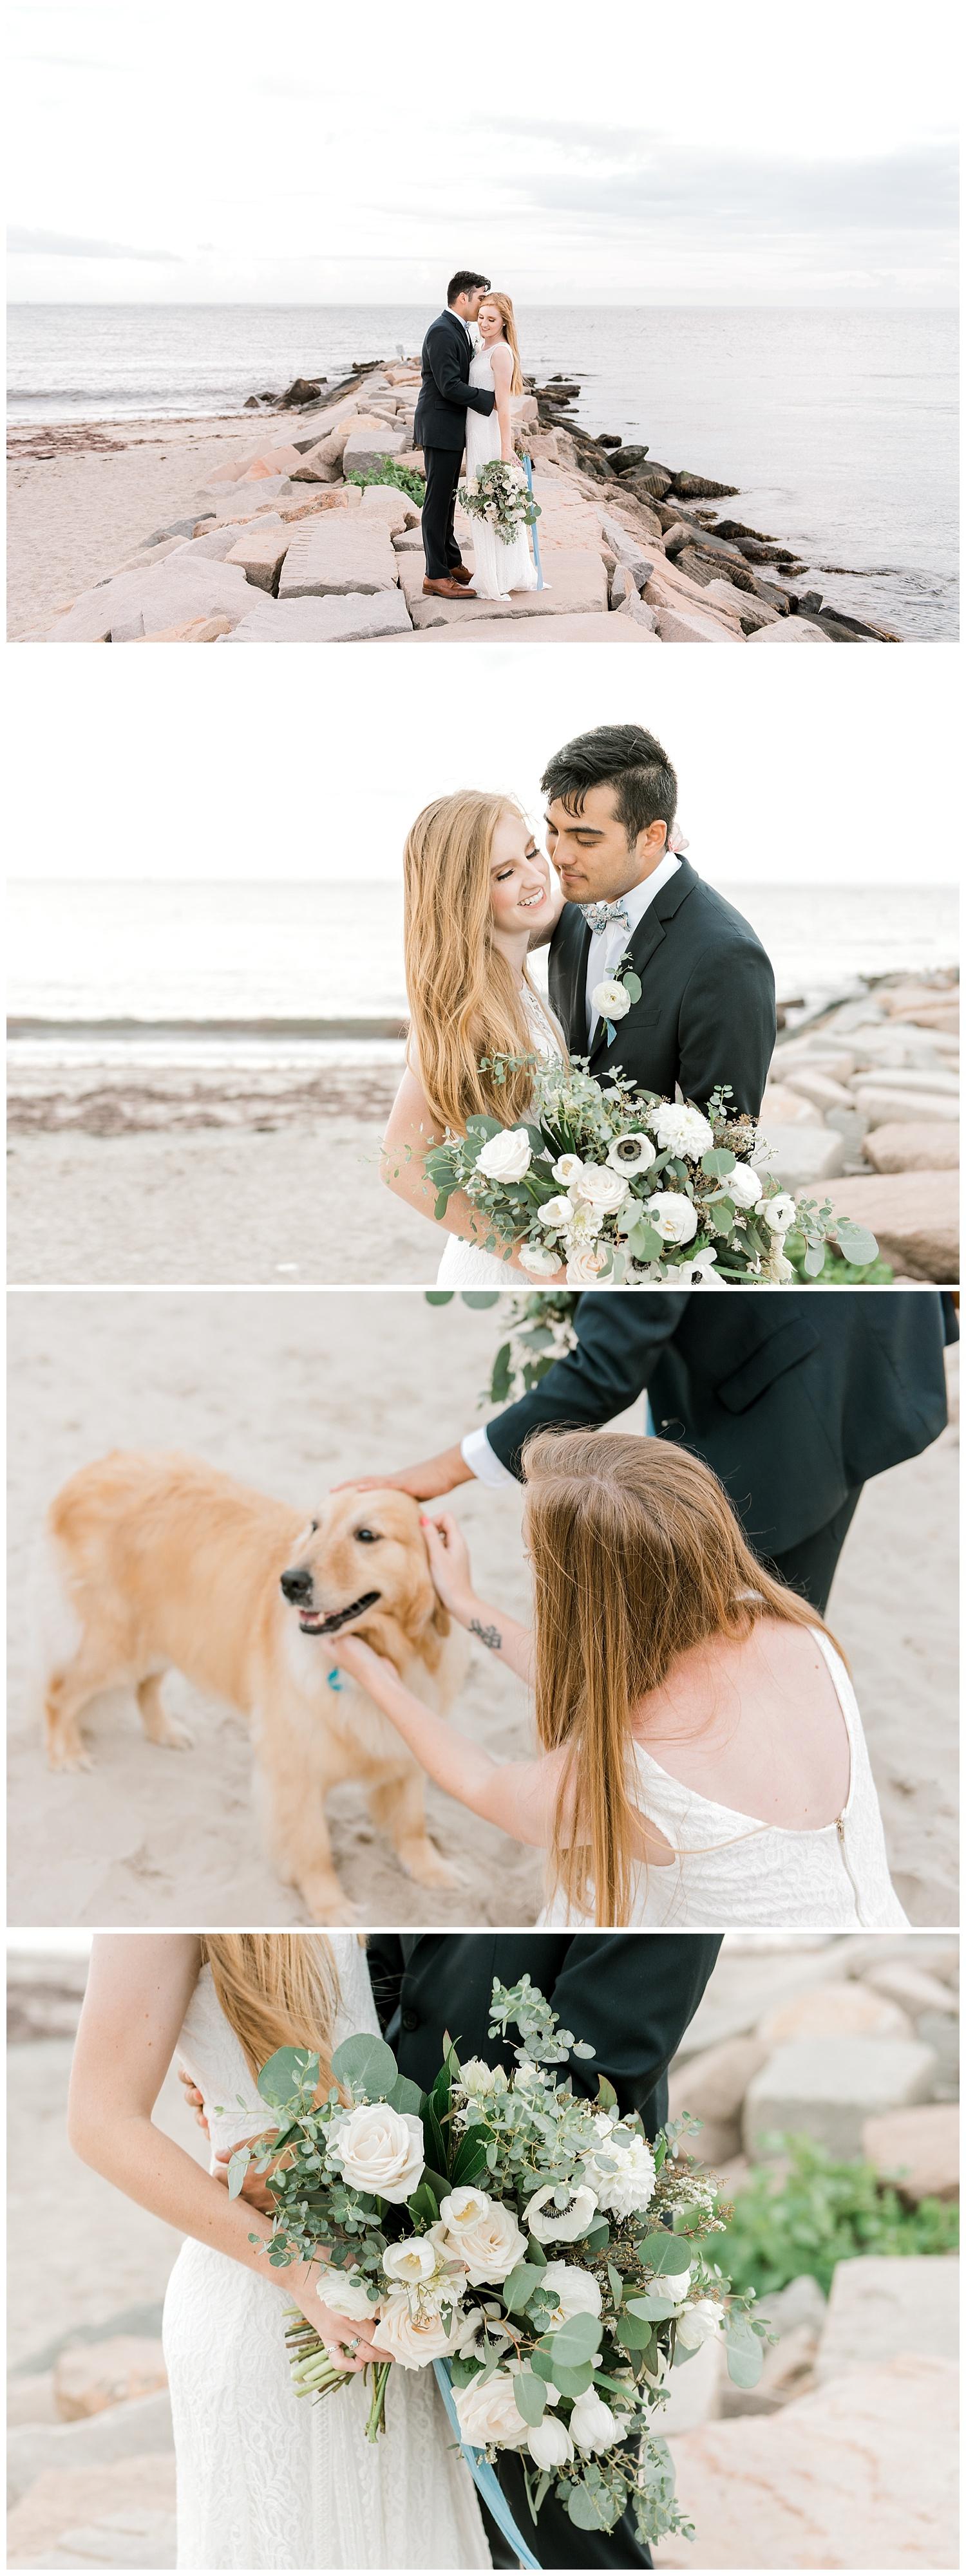 island-nappatree-point-wedding-photography-10.jpg